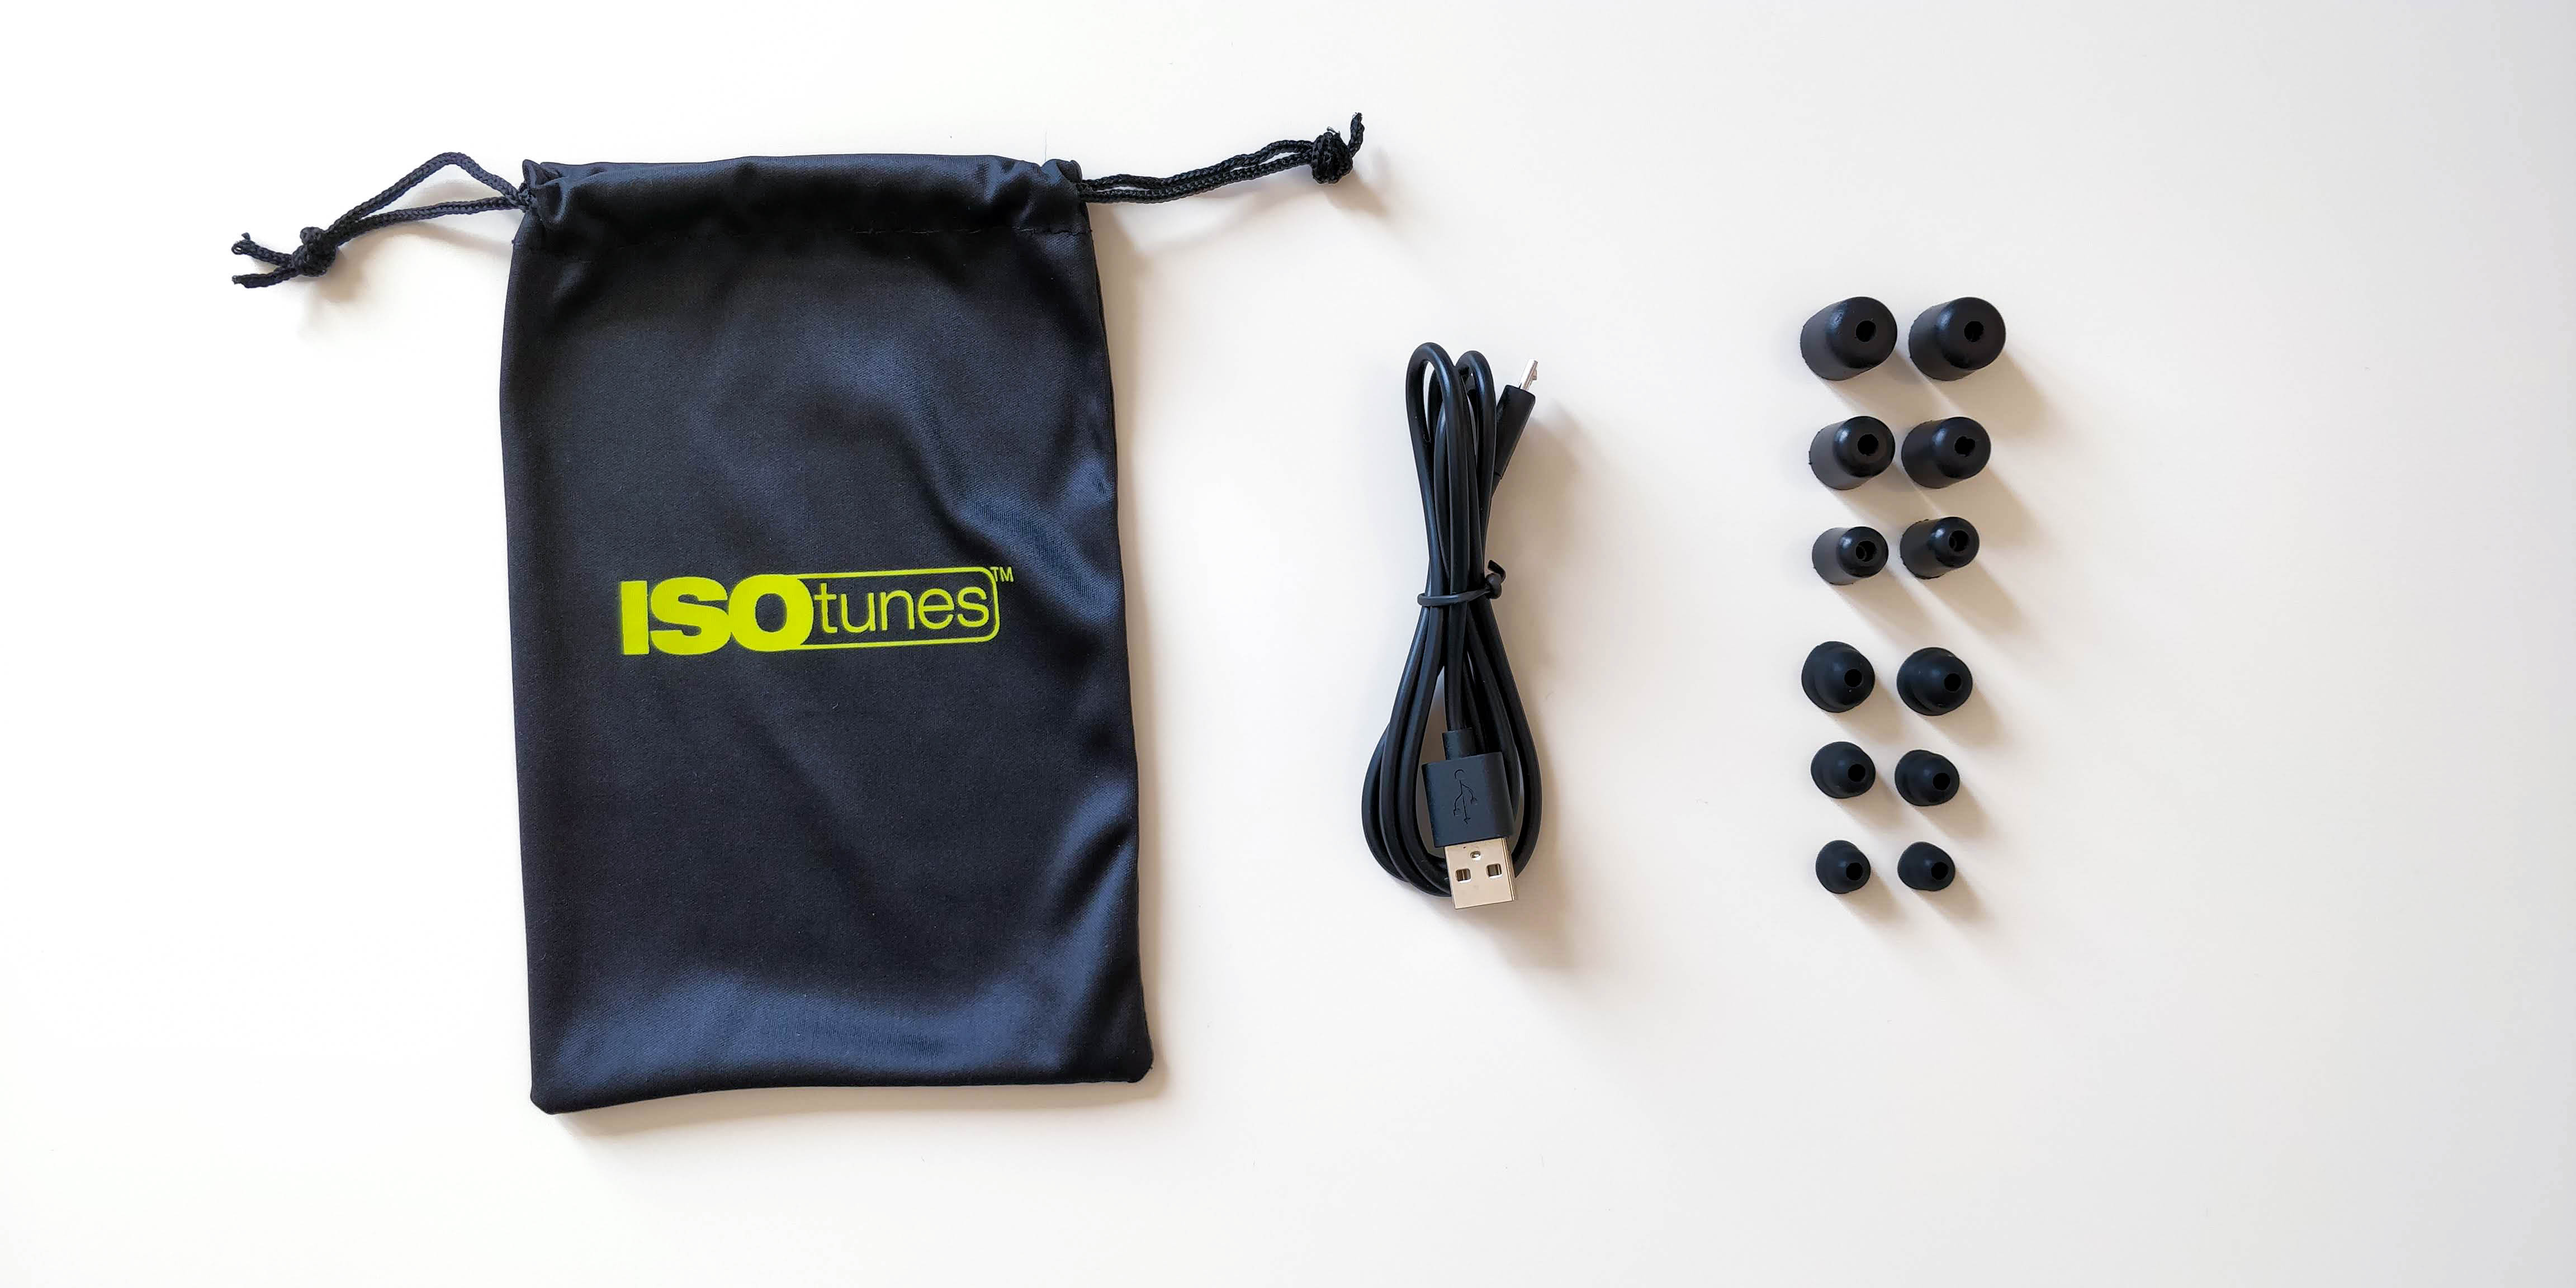 ISOtunes Xtra accessories